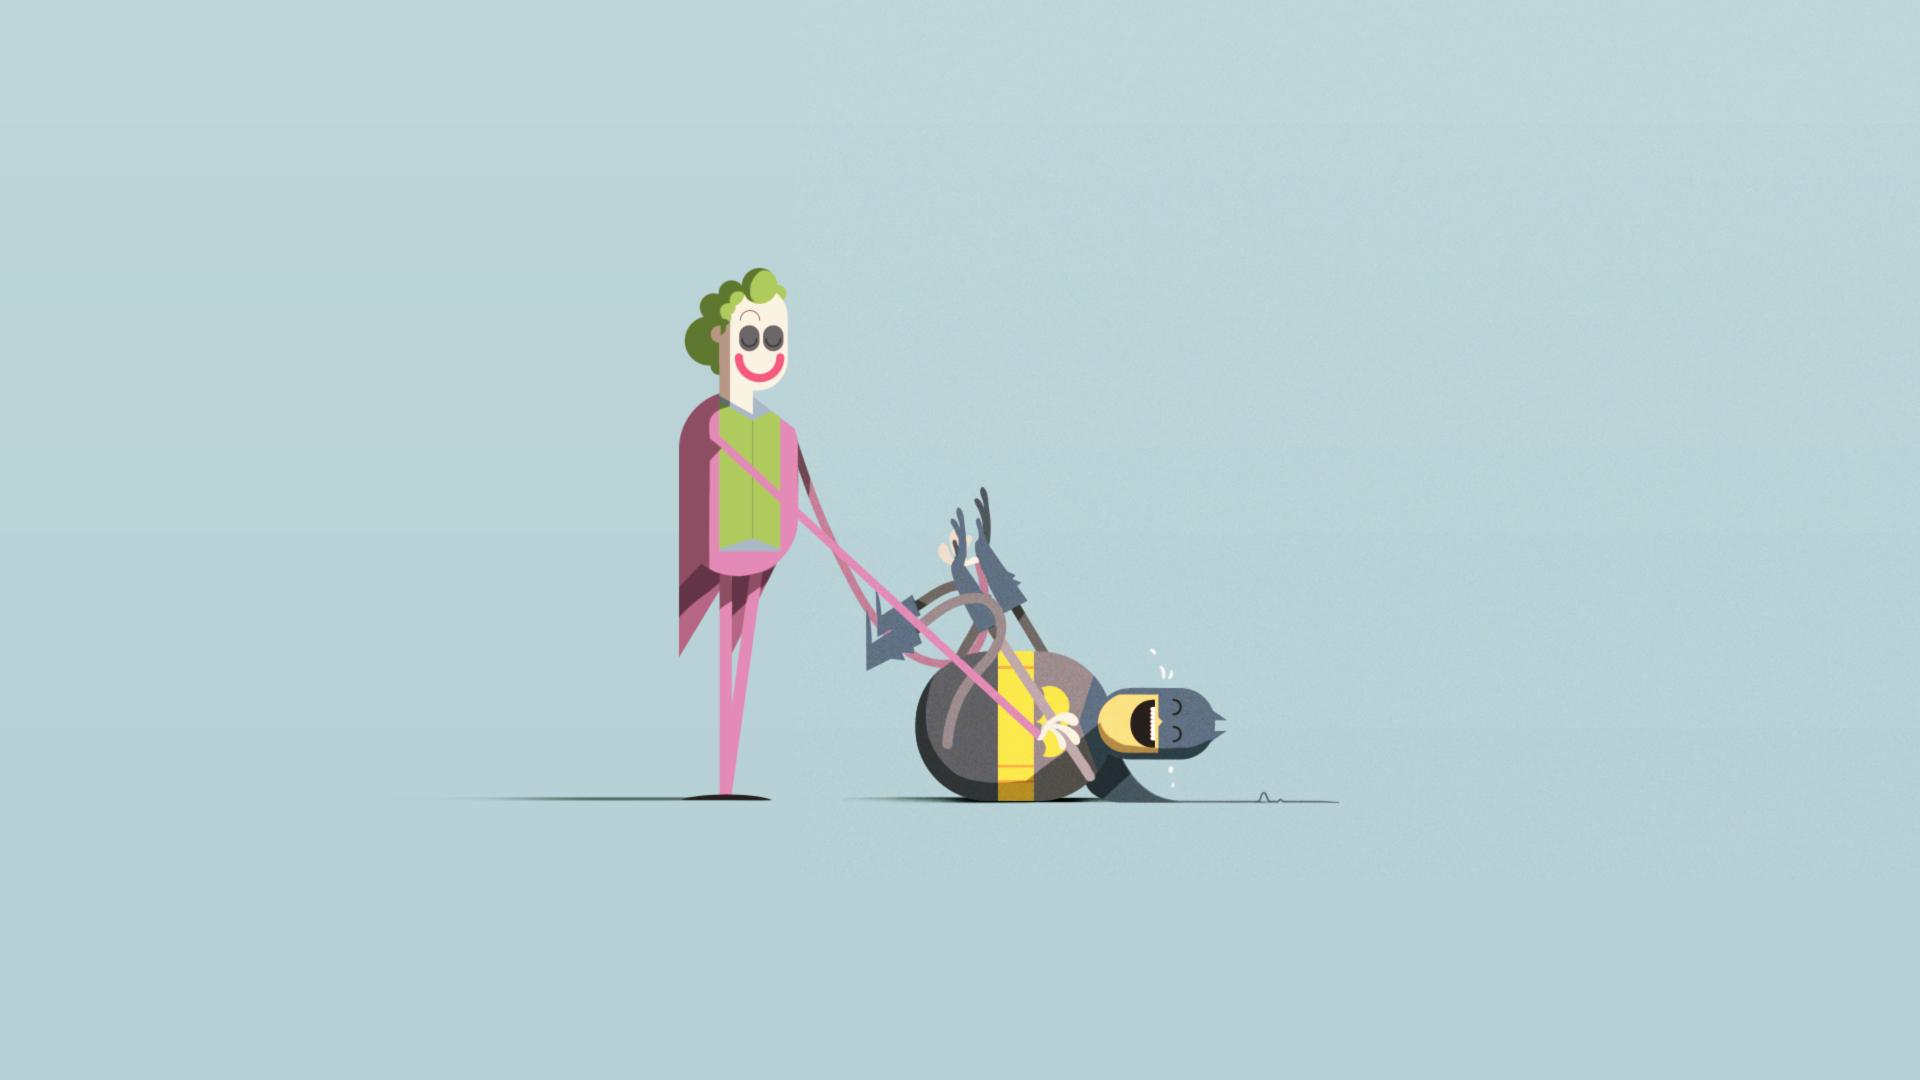 Batman_and_Joker.jpg